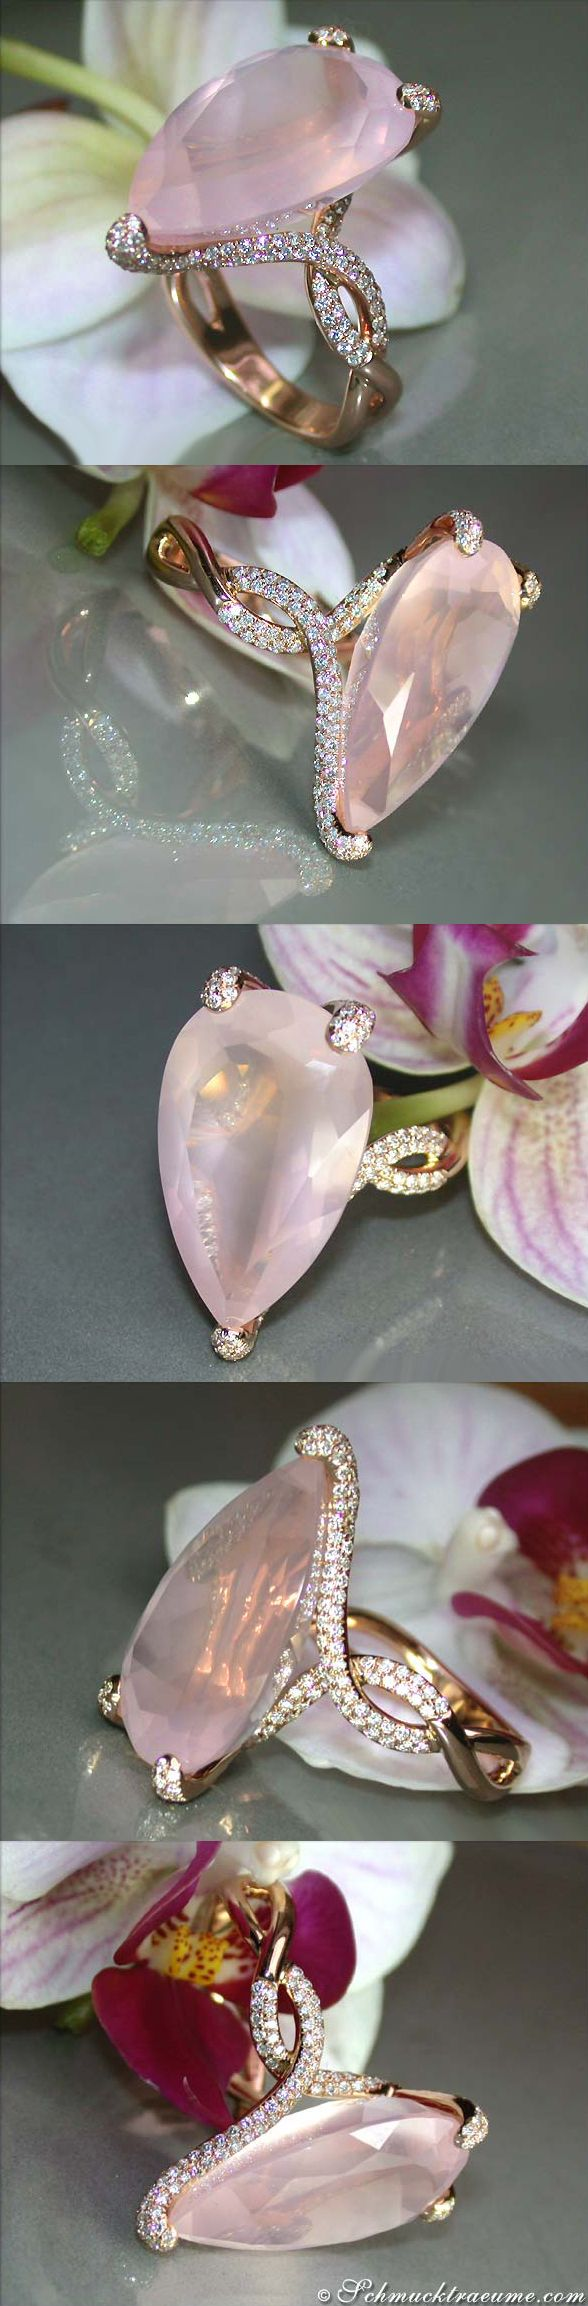 Terrific Rosequartz Diamond Ring, 16.83 ct. RG18K - Visit: schmucktraeume.com Like: https://www.facebook.com/pages/Noble-Juwelen/150871984924926 Mail: info@schmucktraeume.com